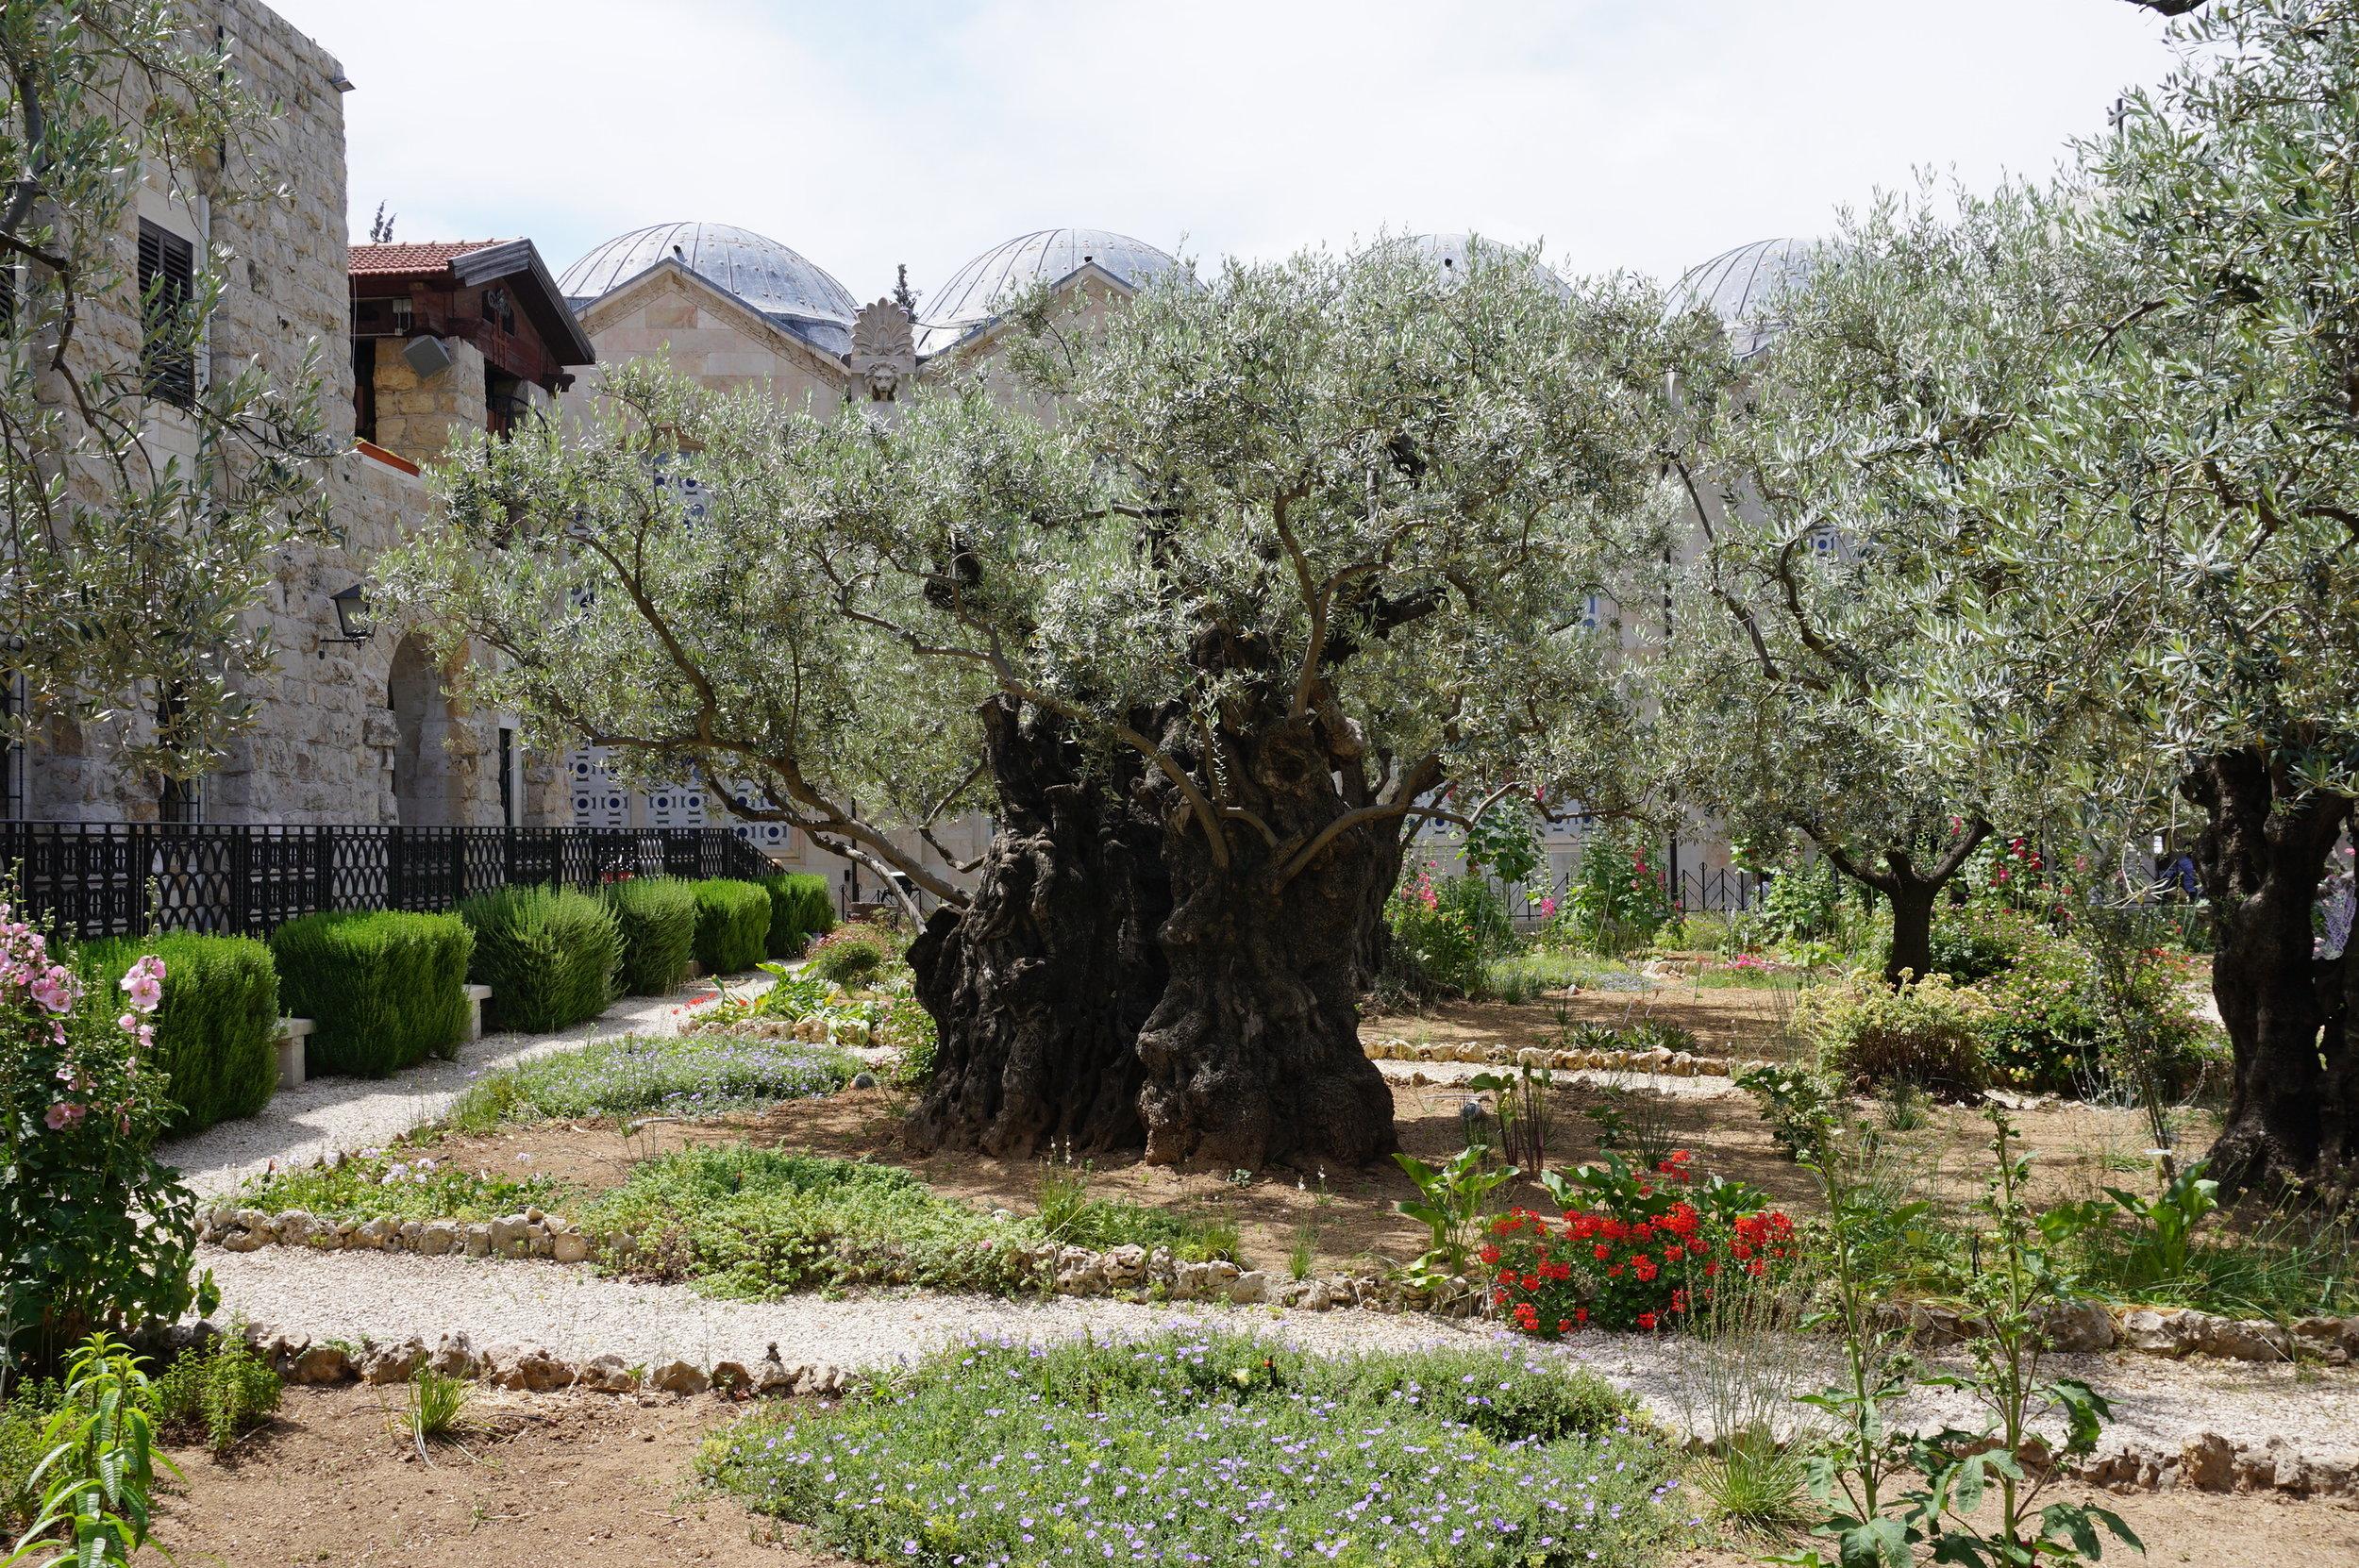 Garden of Gethsemane Jerusalem Israel 1.JPG